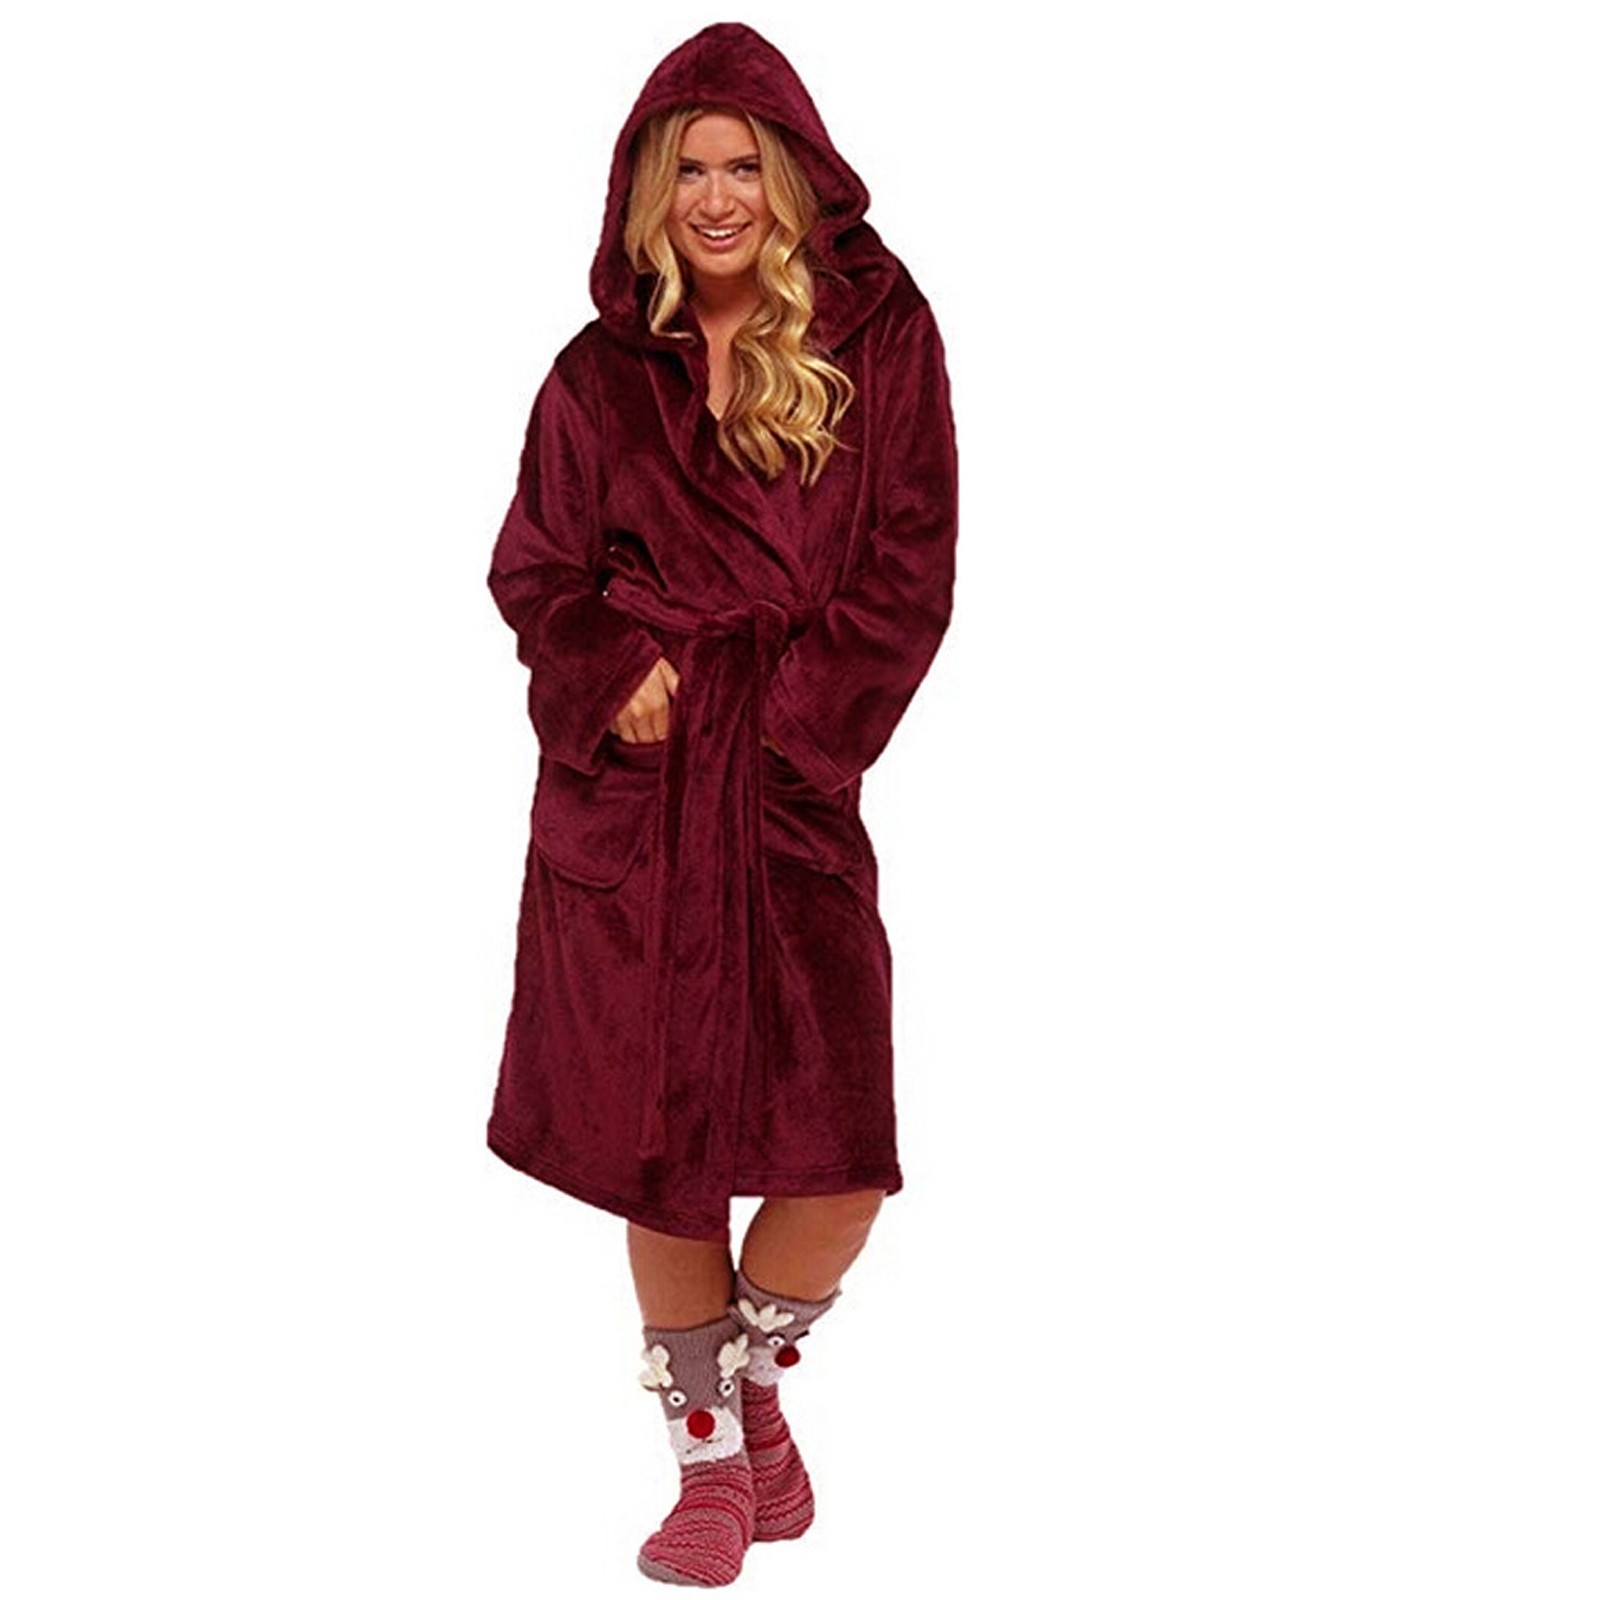 Winter Women Nightgown Plush Lengthened Shawl Bathrobe Home Clothes Long Sleeved Robe Loose Christmas Hooded Nightdress Pijamas